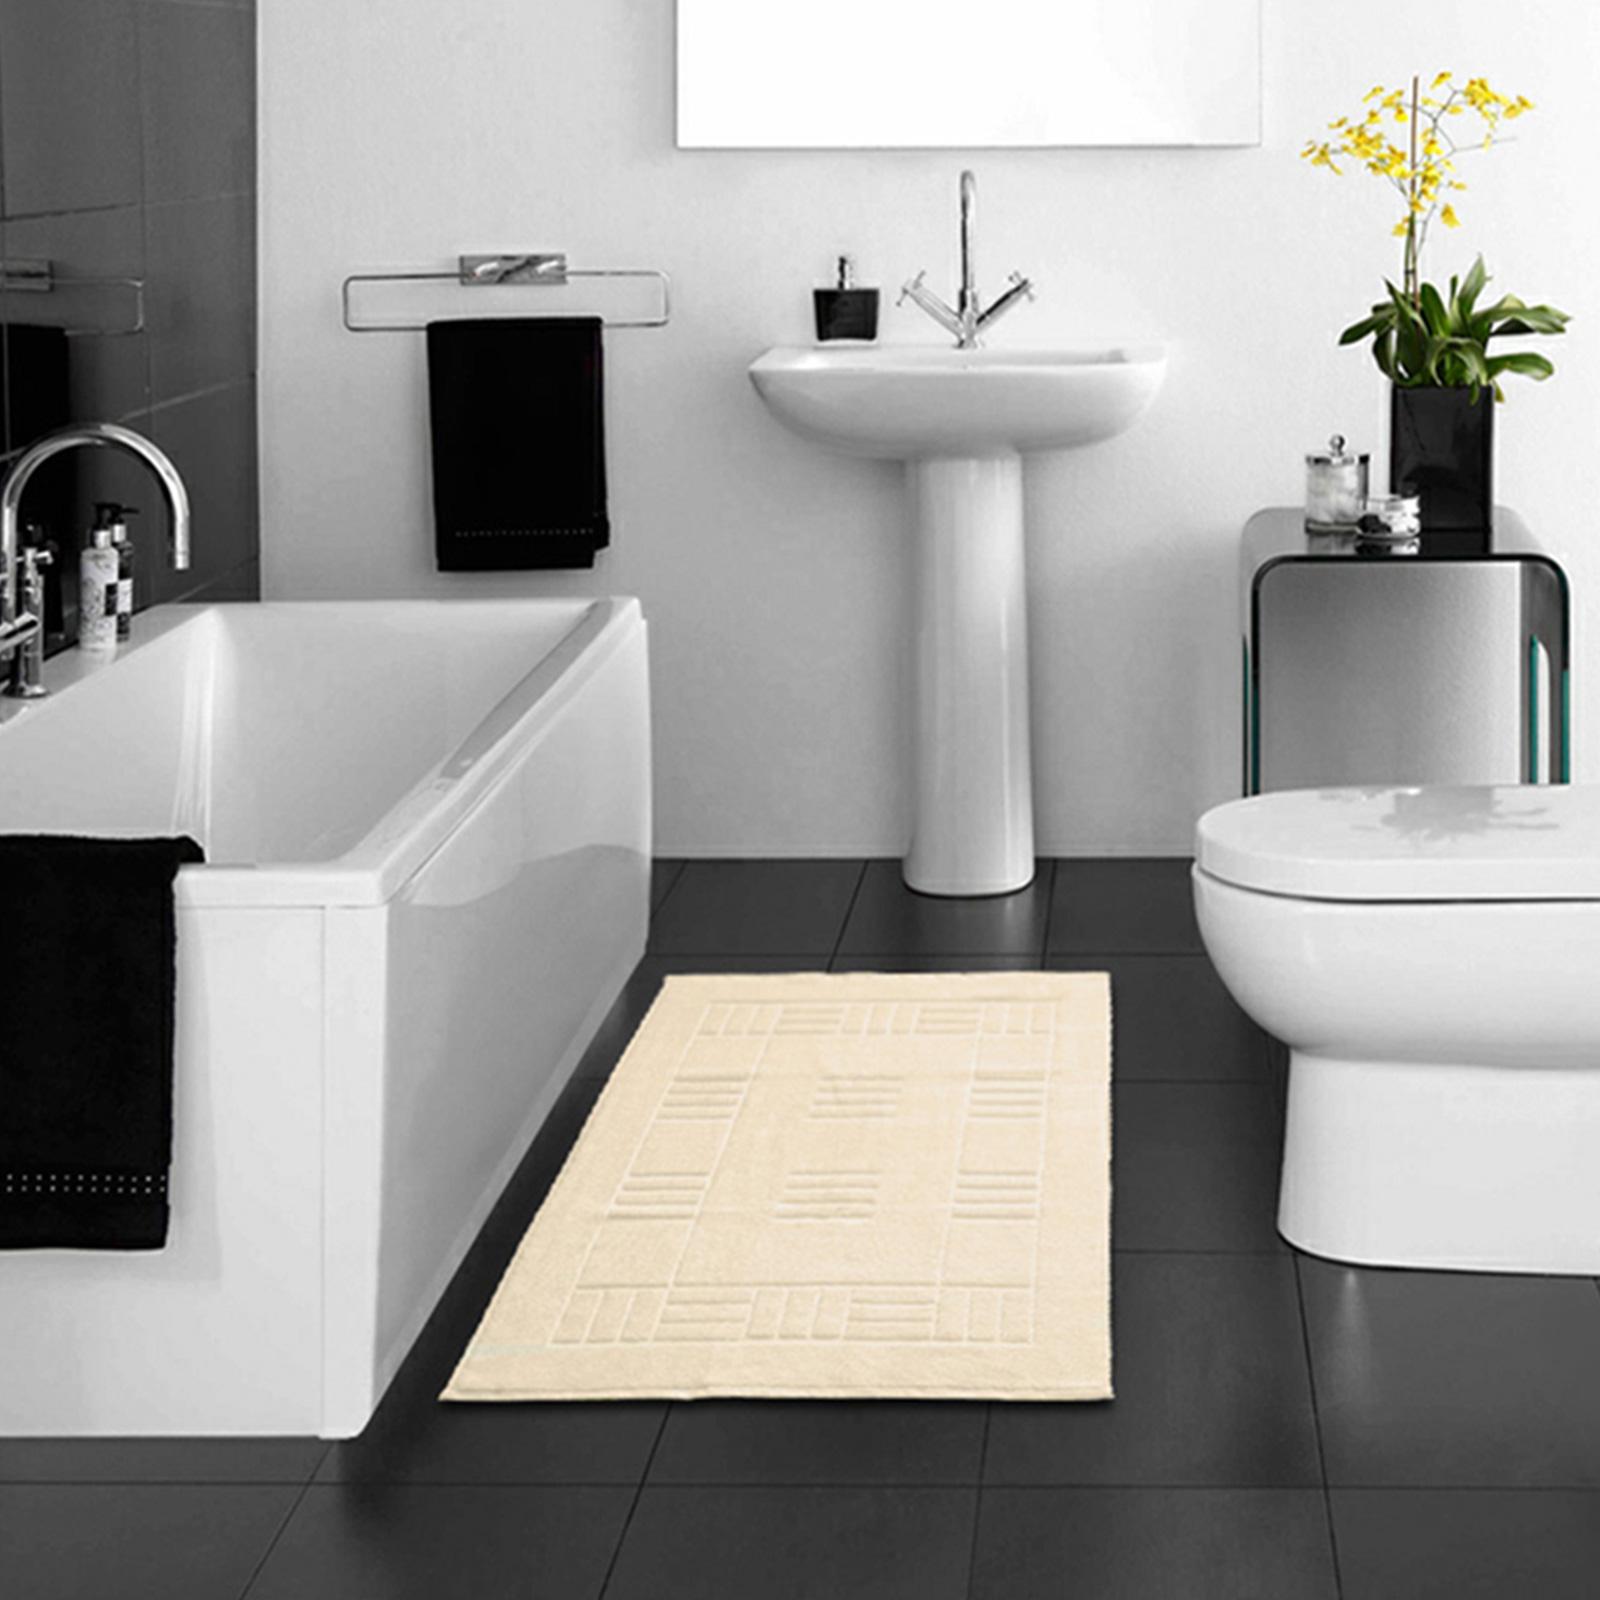 100 Egyptian Cotton Bathroom Mats Rugs Super Soft